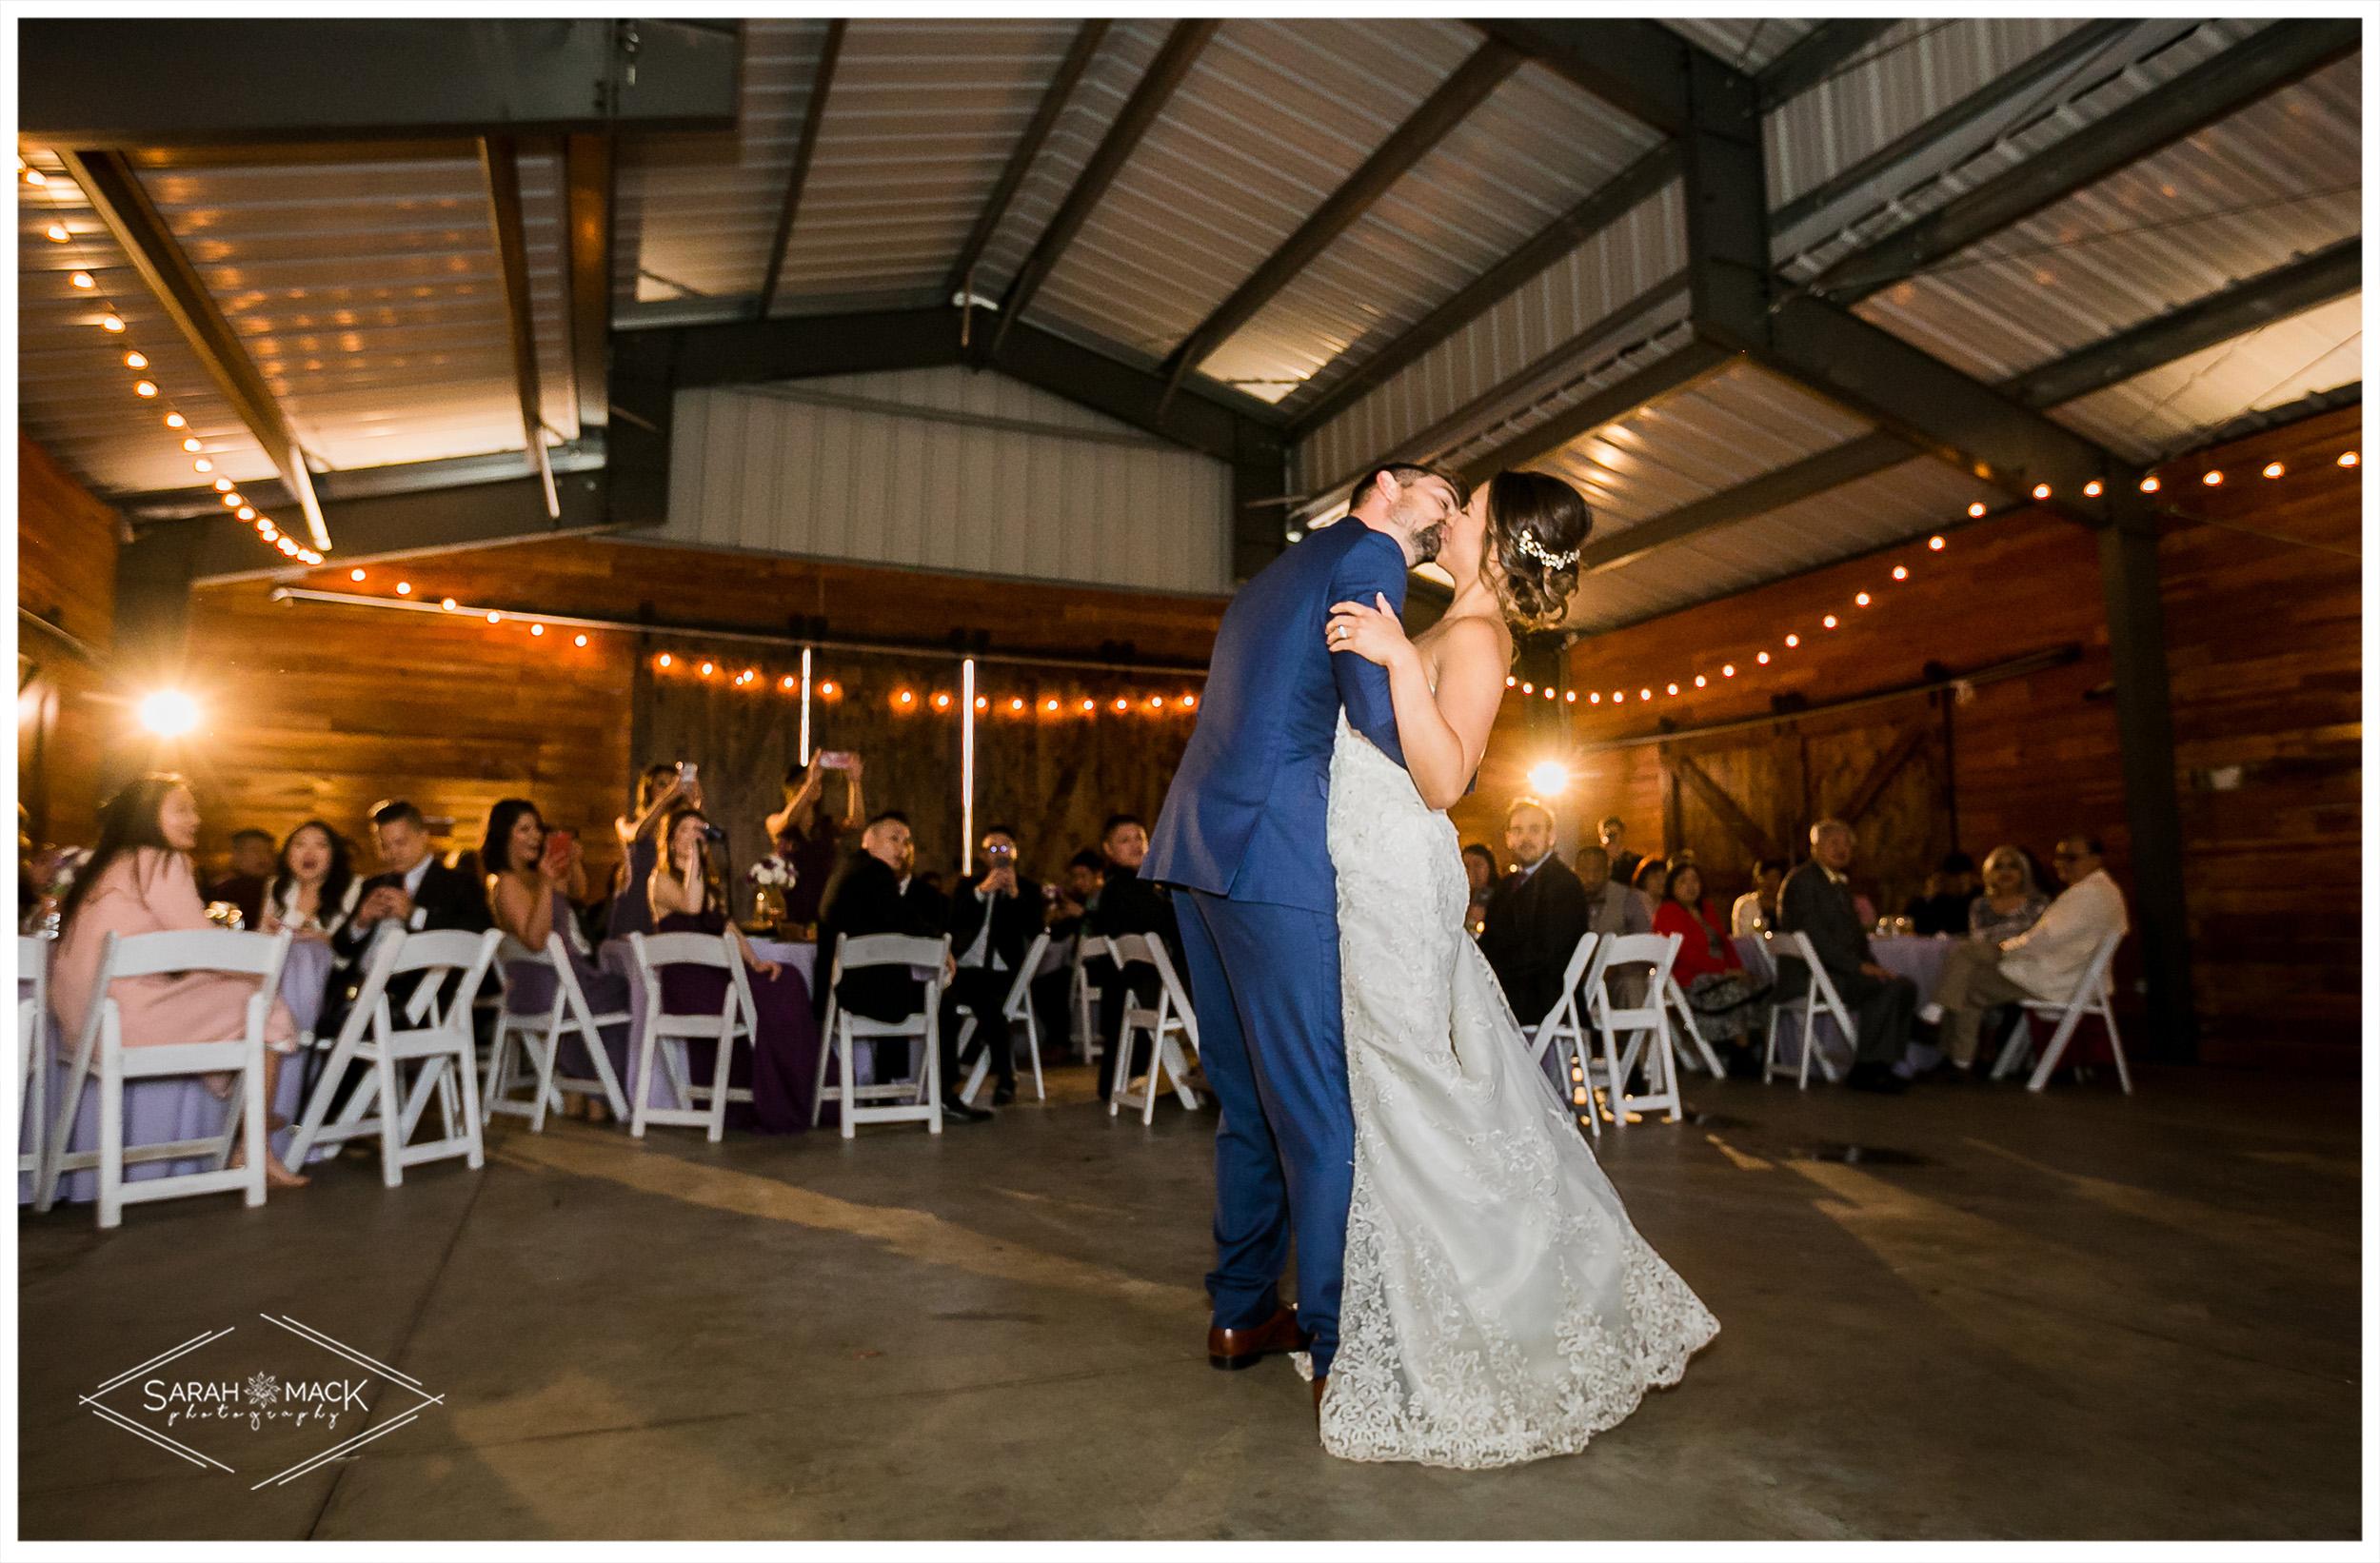 PG-Owl-Creek-Farms-Temecula-Wedding-Photography-55.jpg